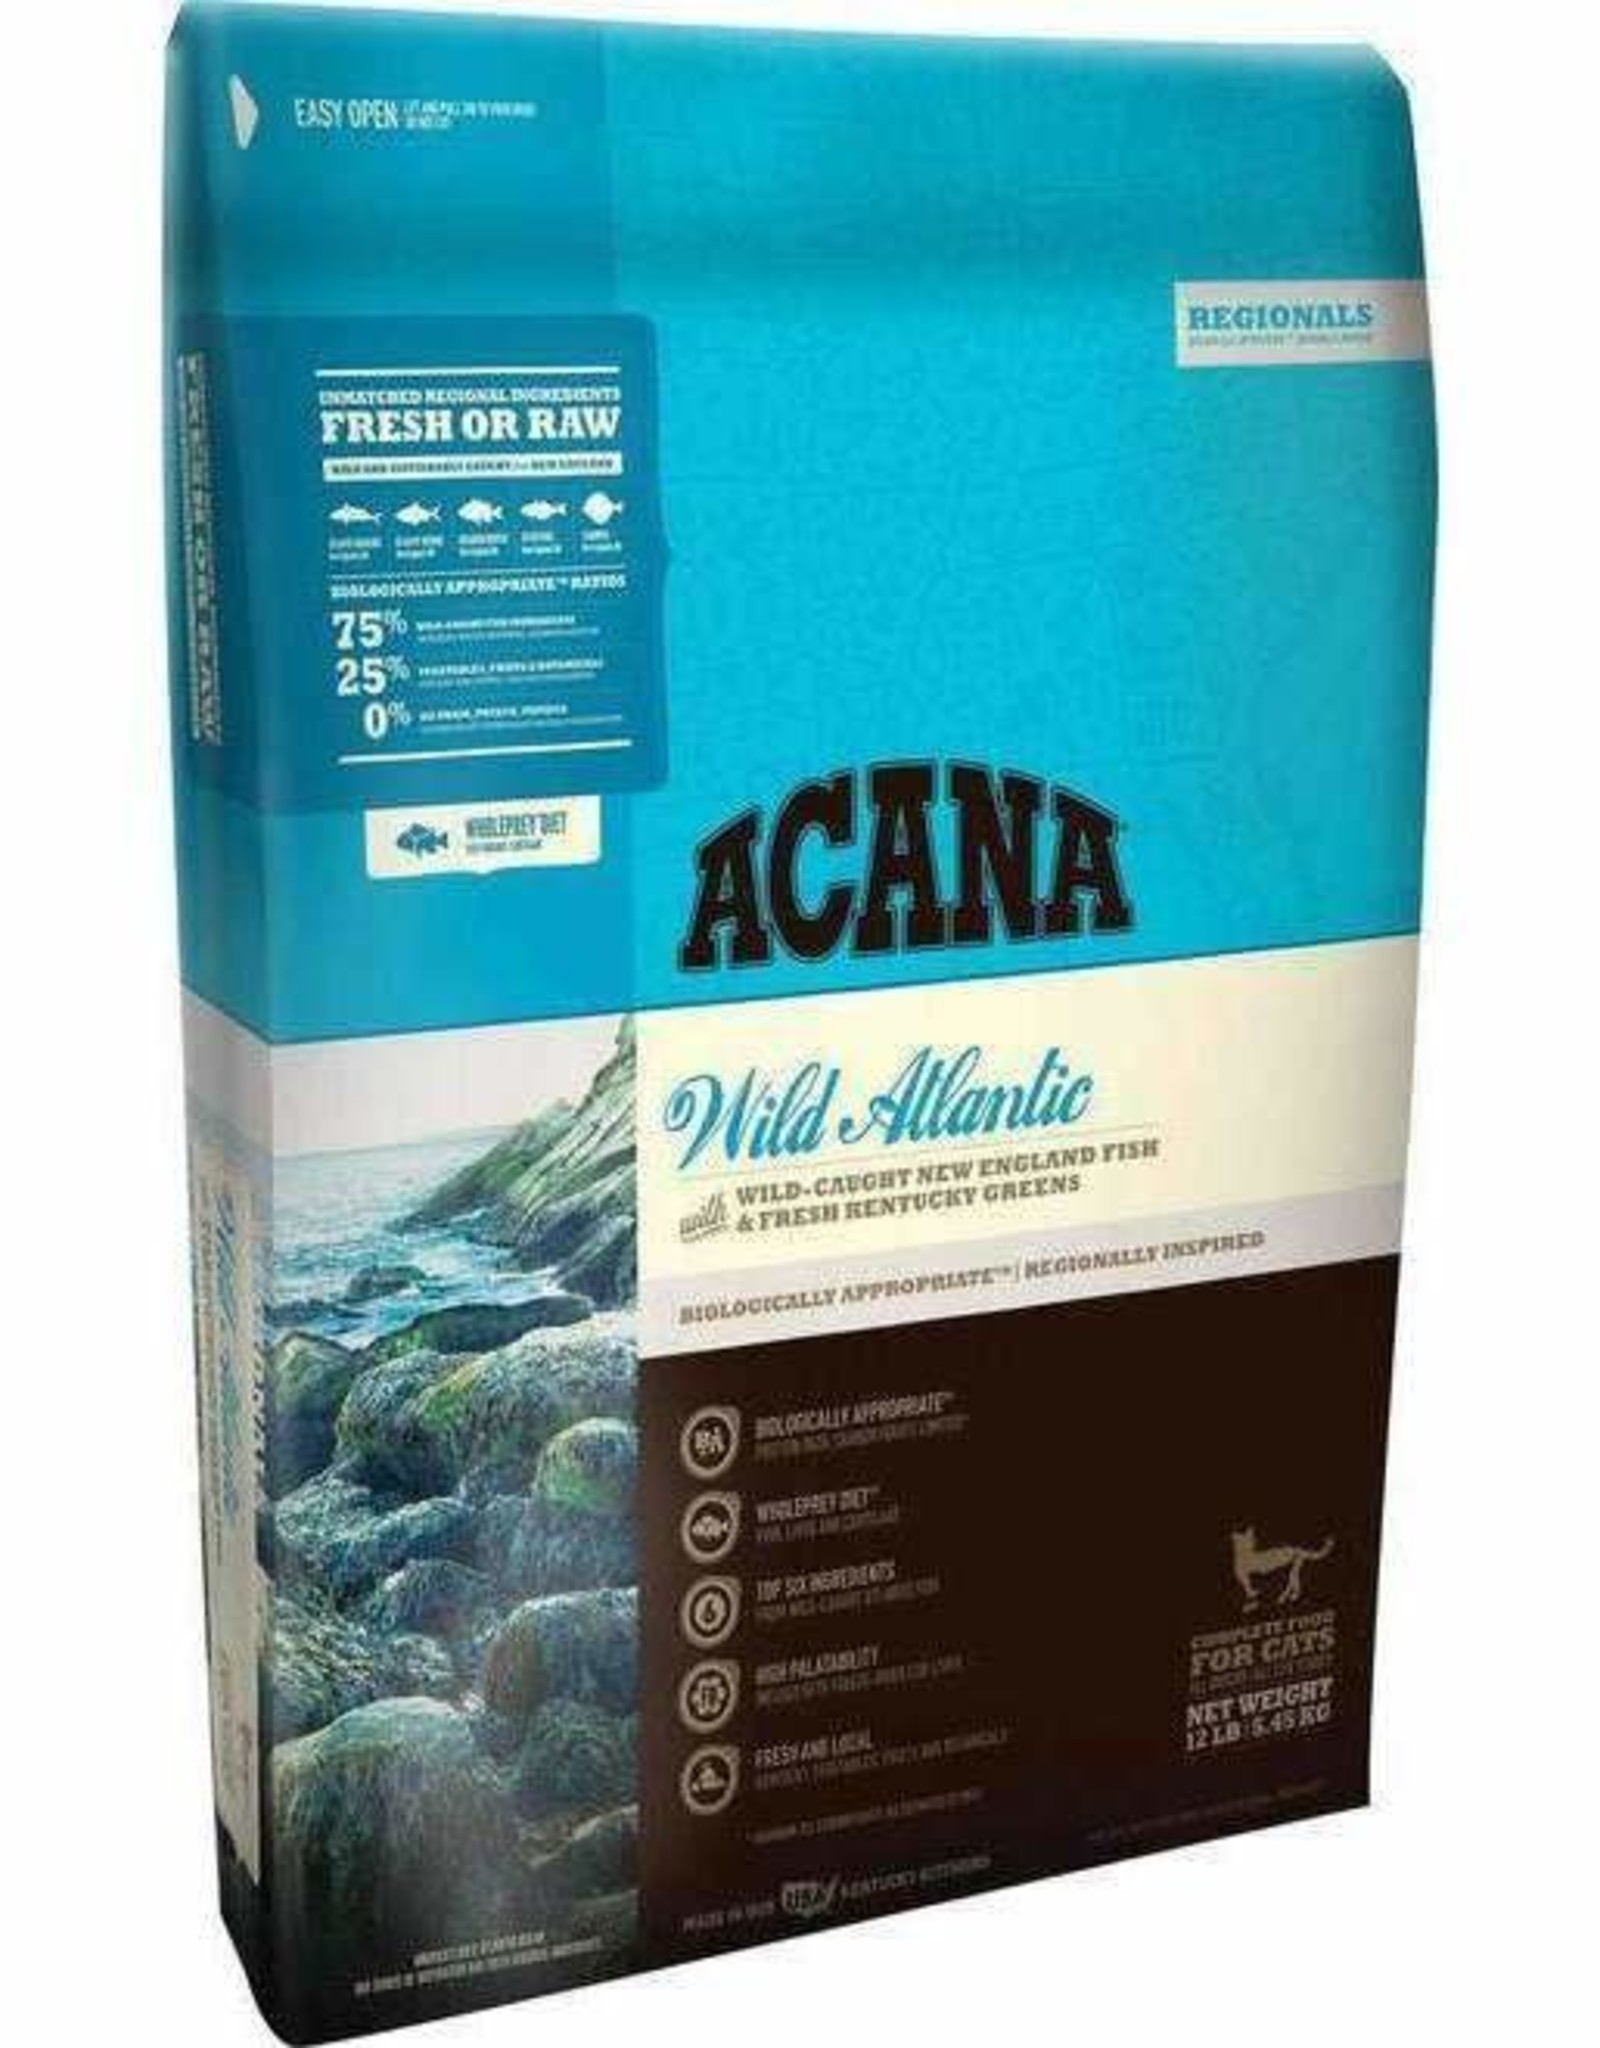 Acana Acana Wild Atlantic Dry Cat Food 12 lb